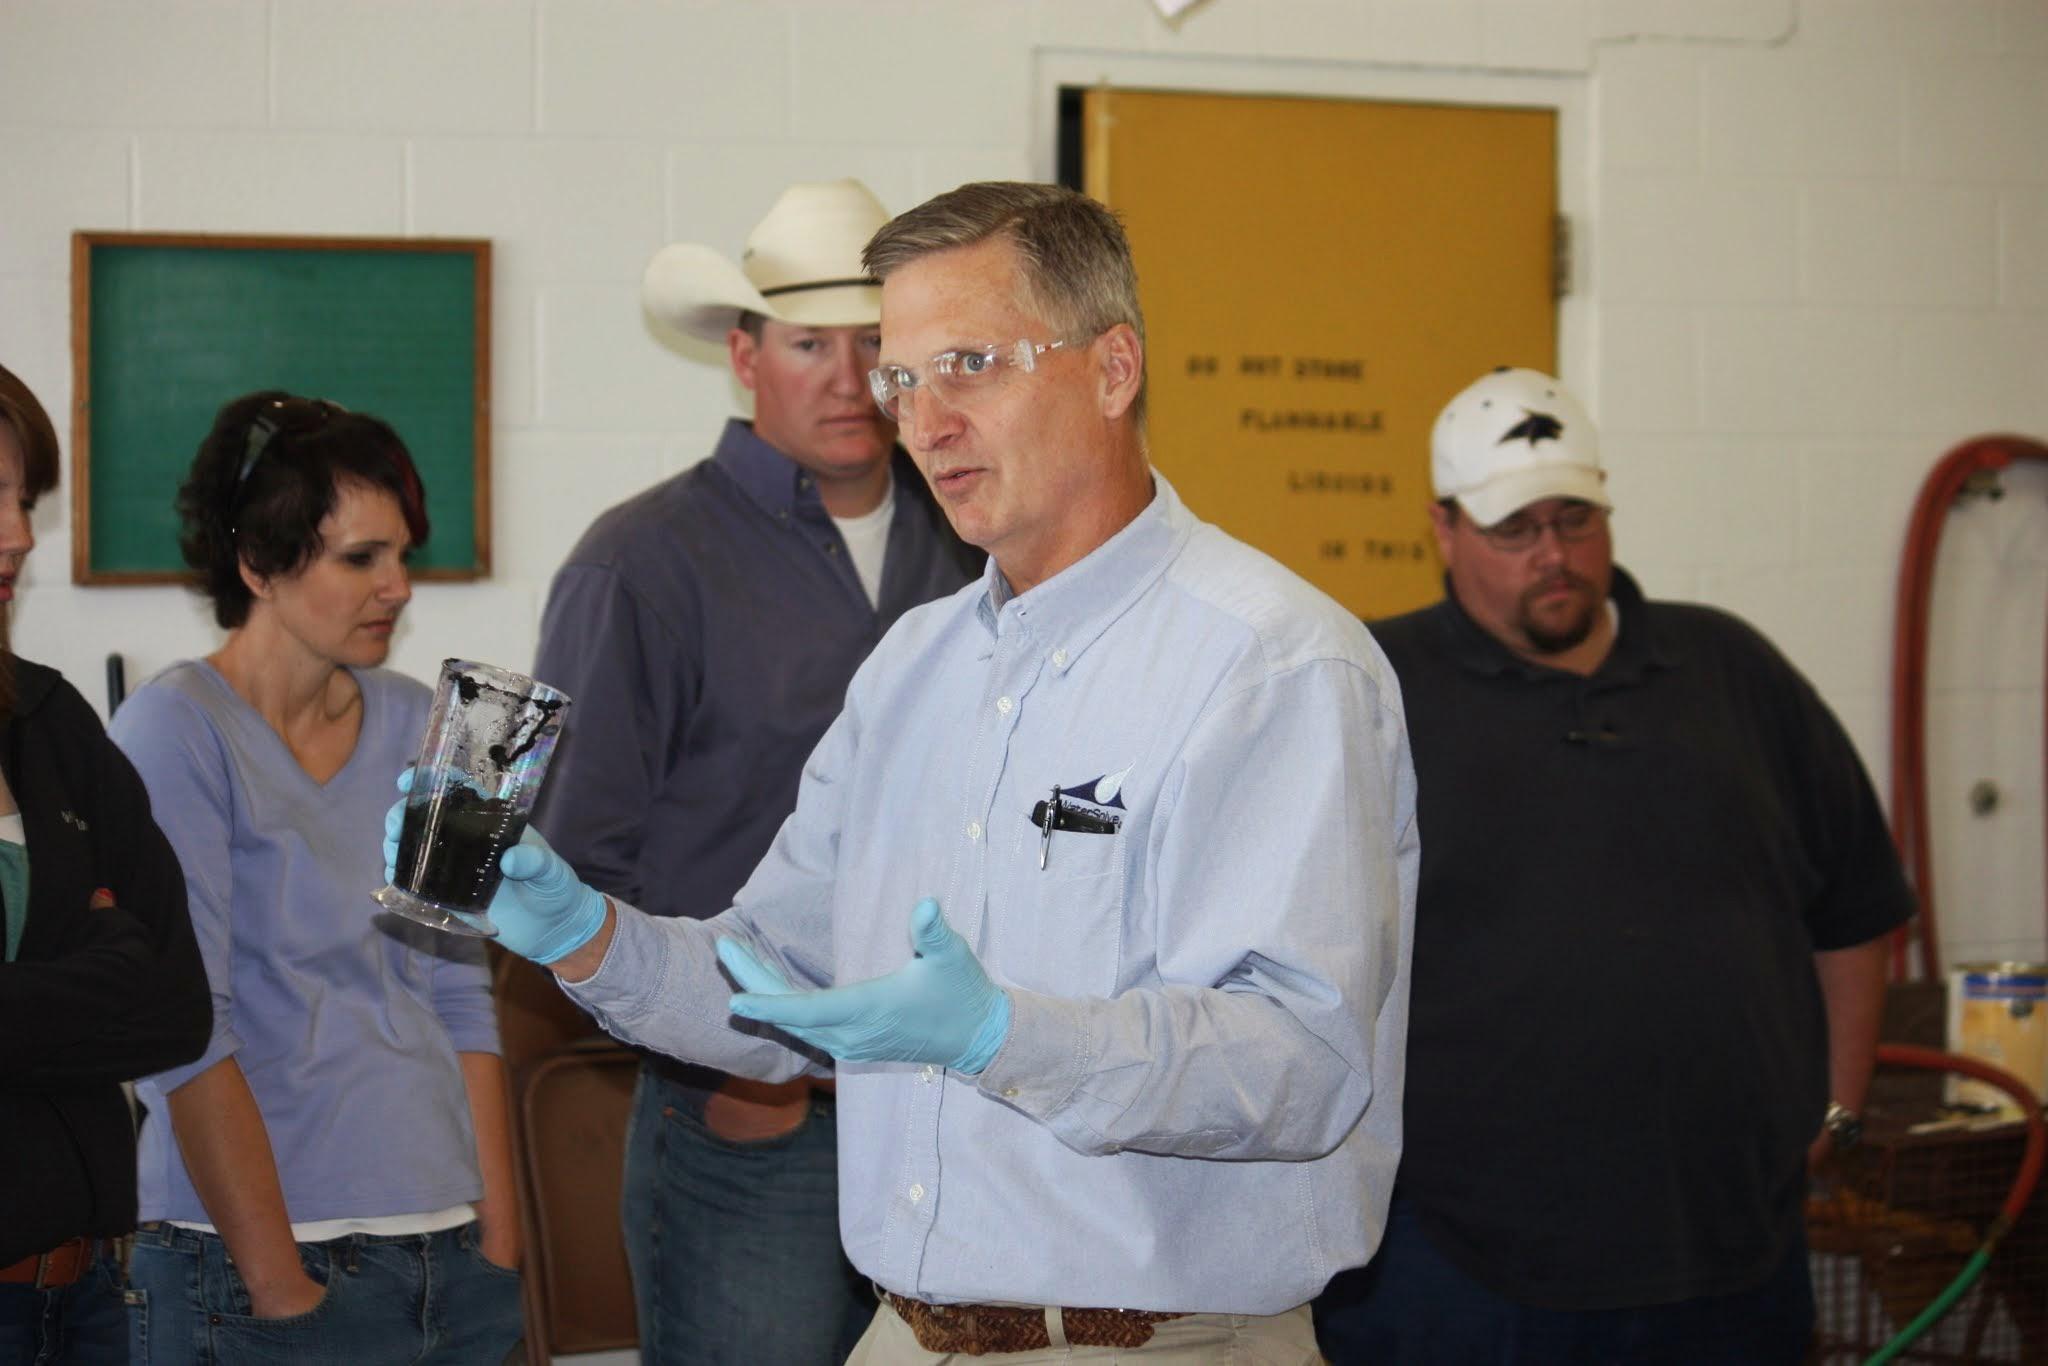 Randy Wilcox, Technical Sales